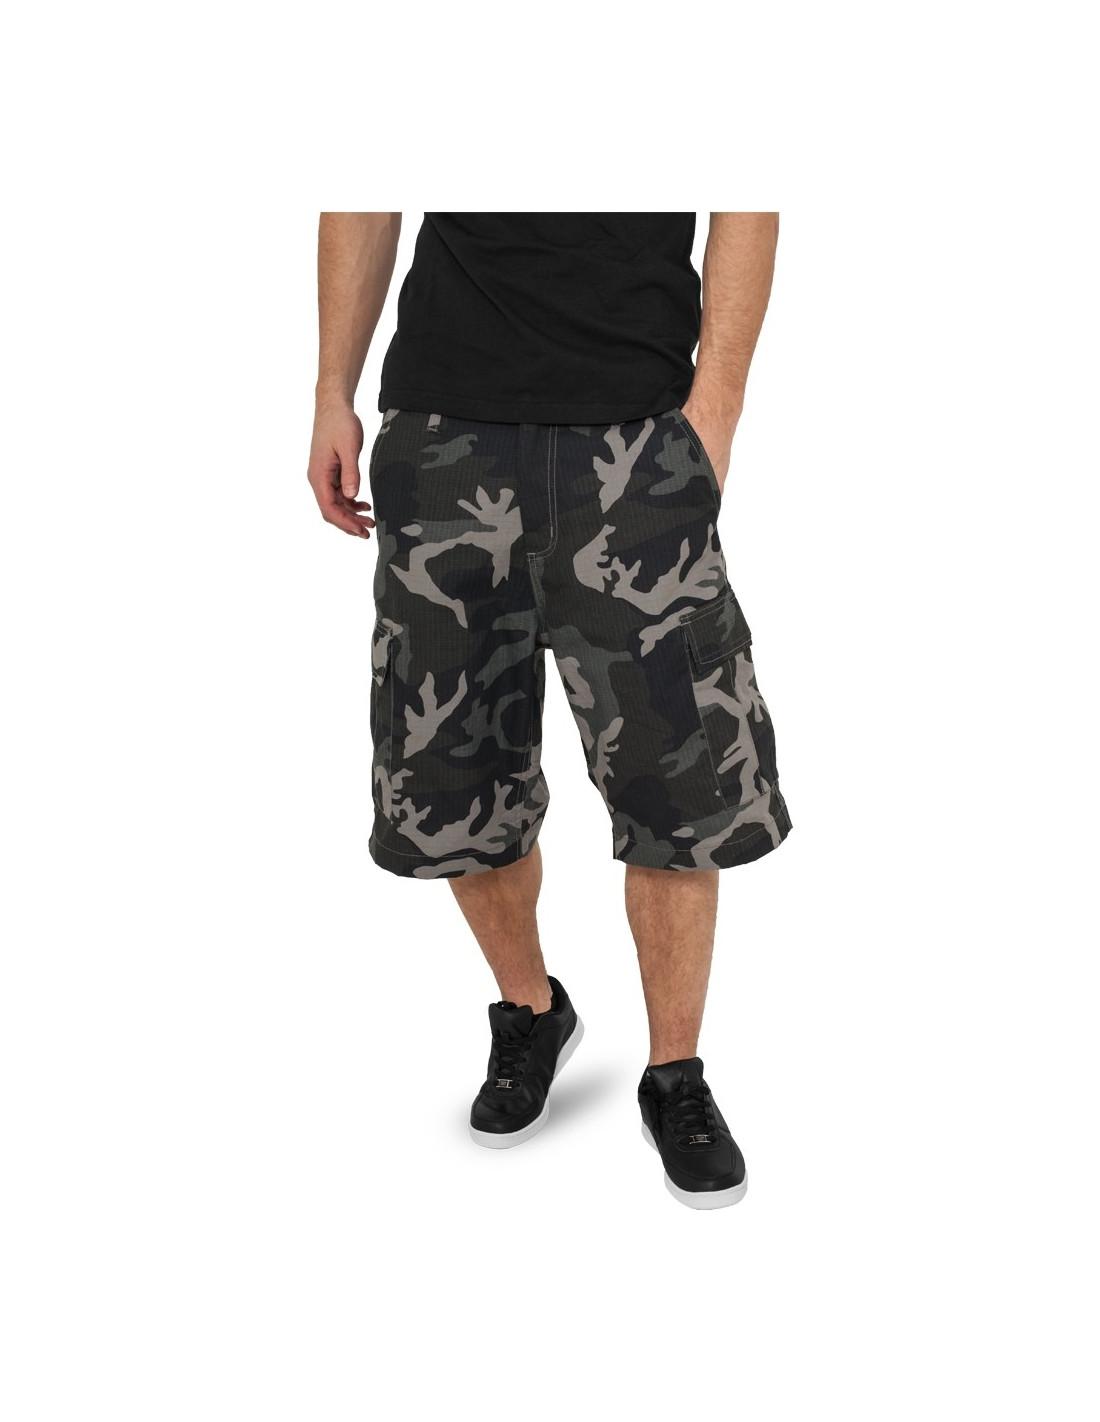 Urban Camouflage Cargo Shorts urban camo